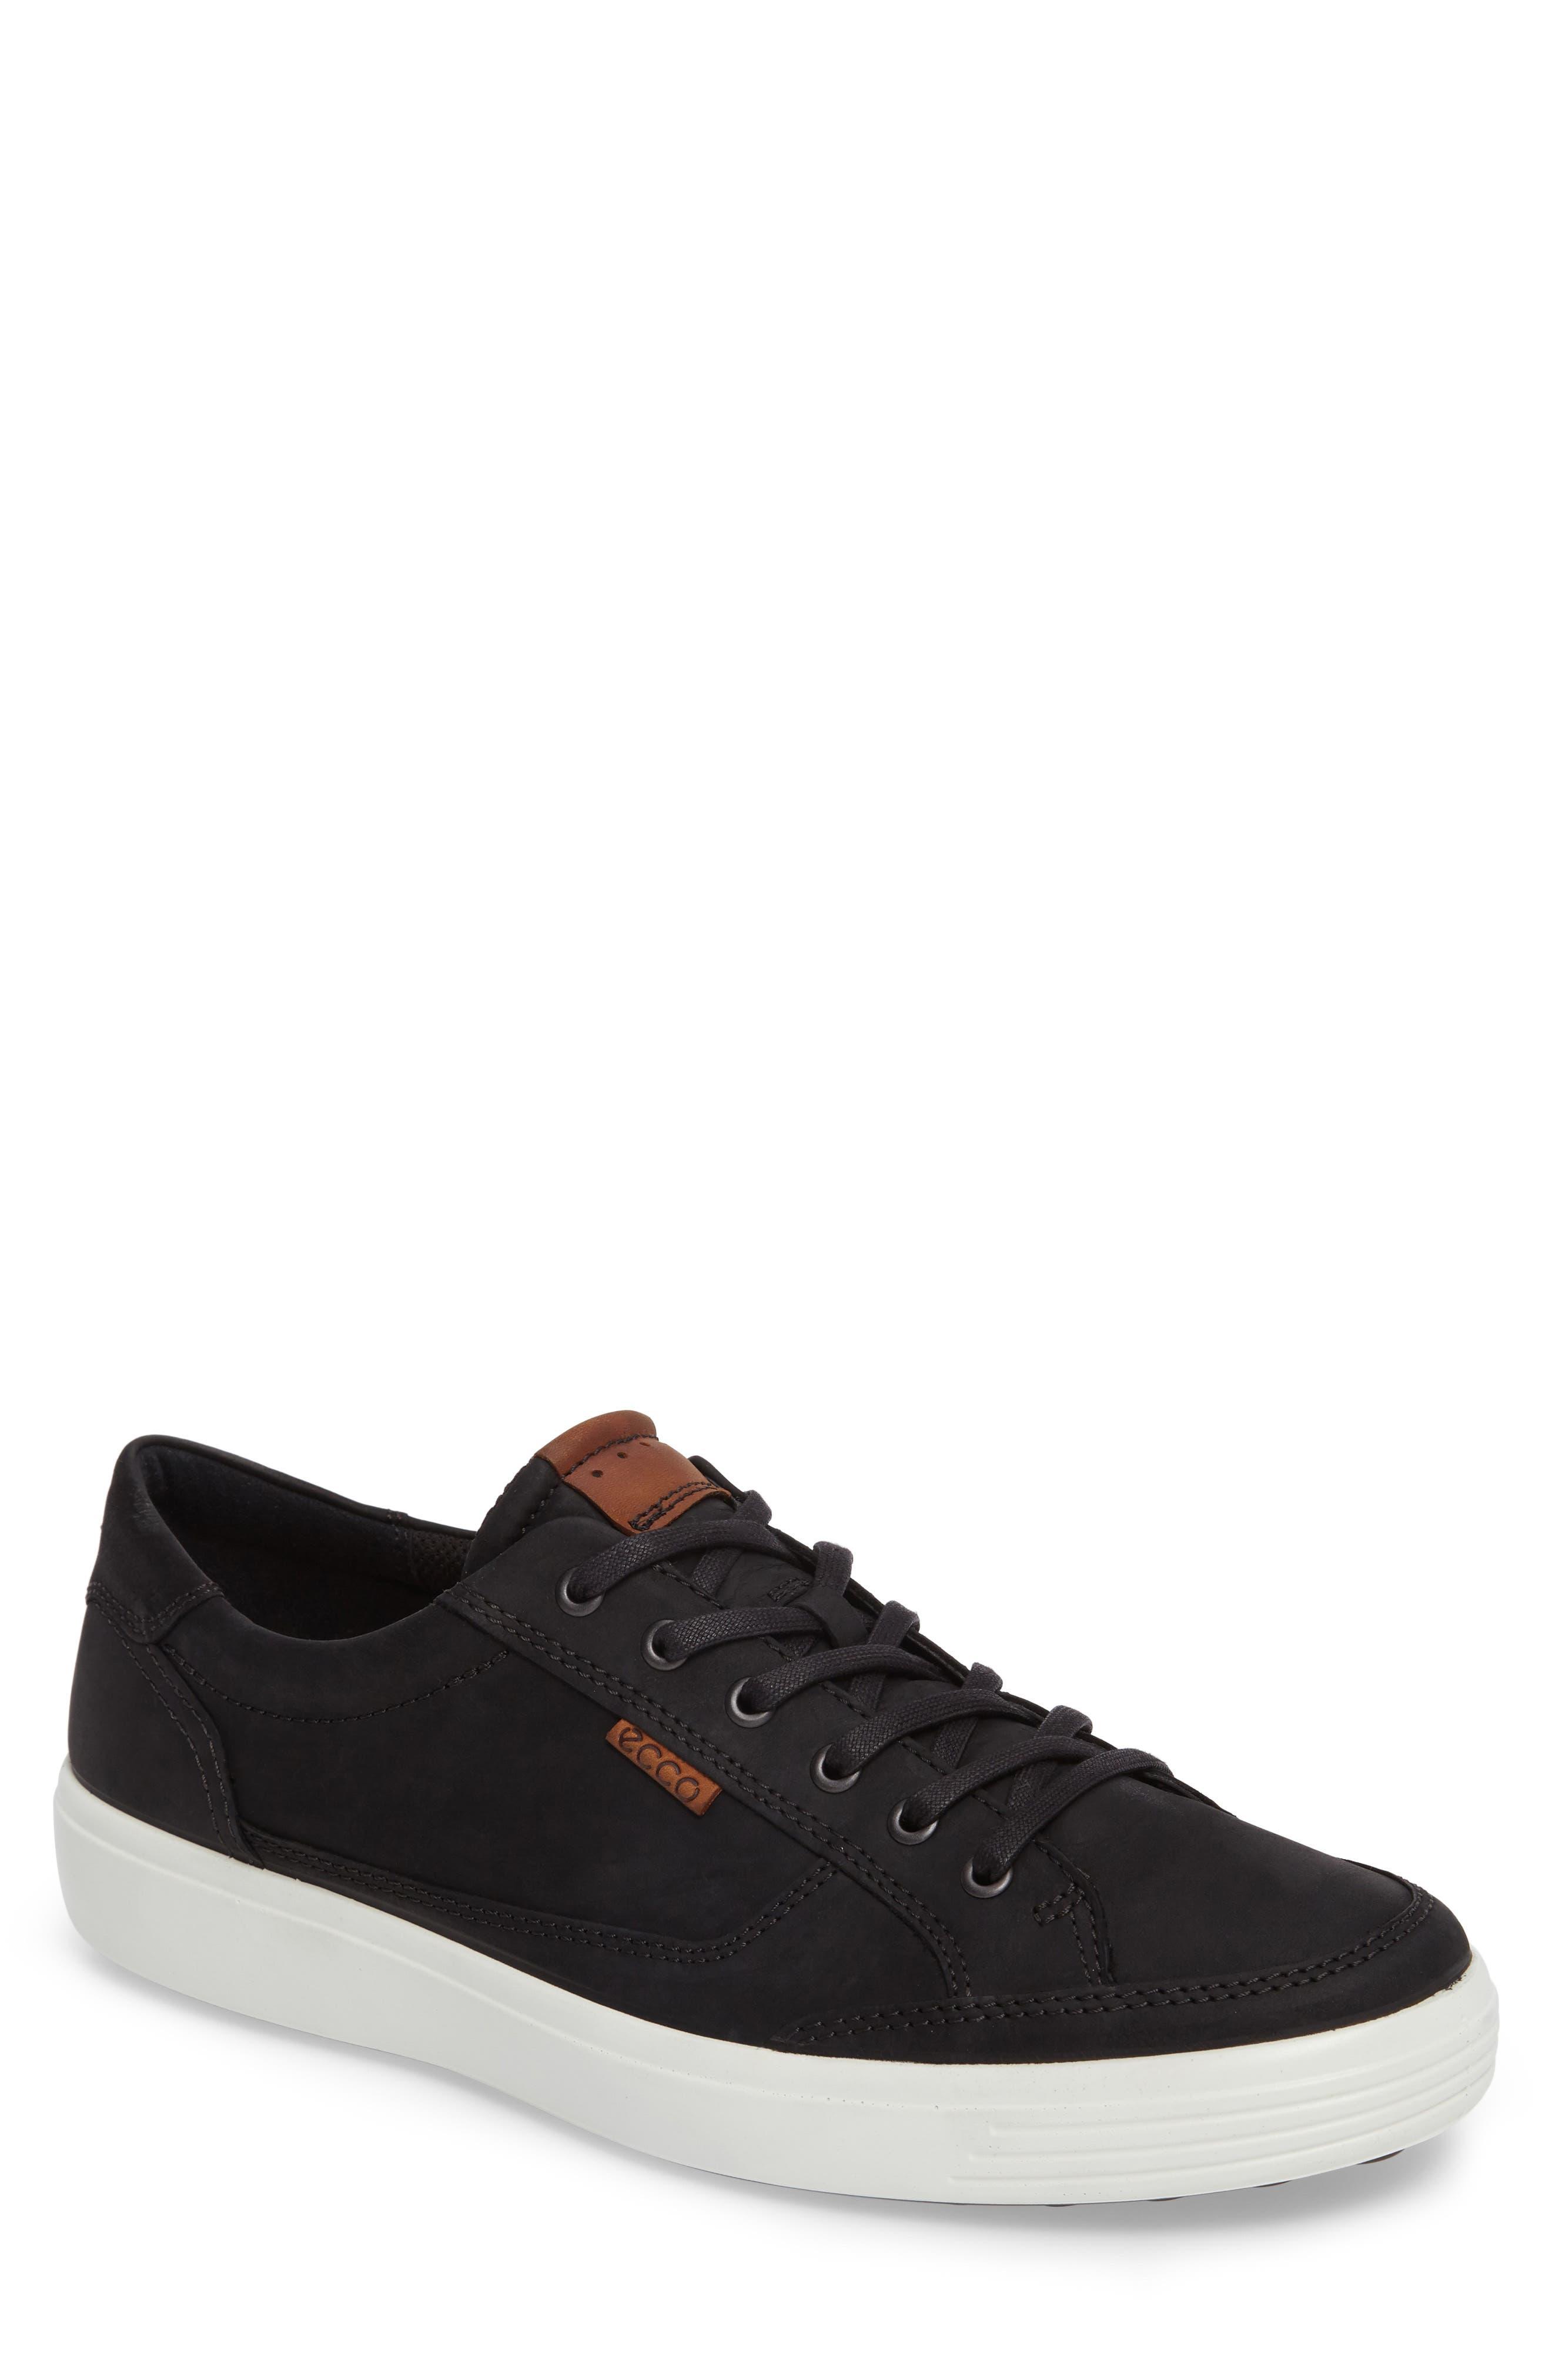 Ecco Soft 7 Long Lace Sneaker